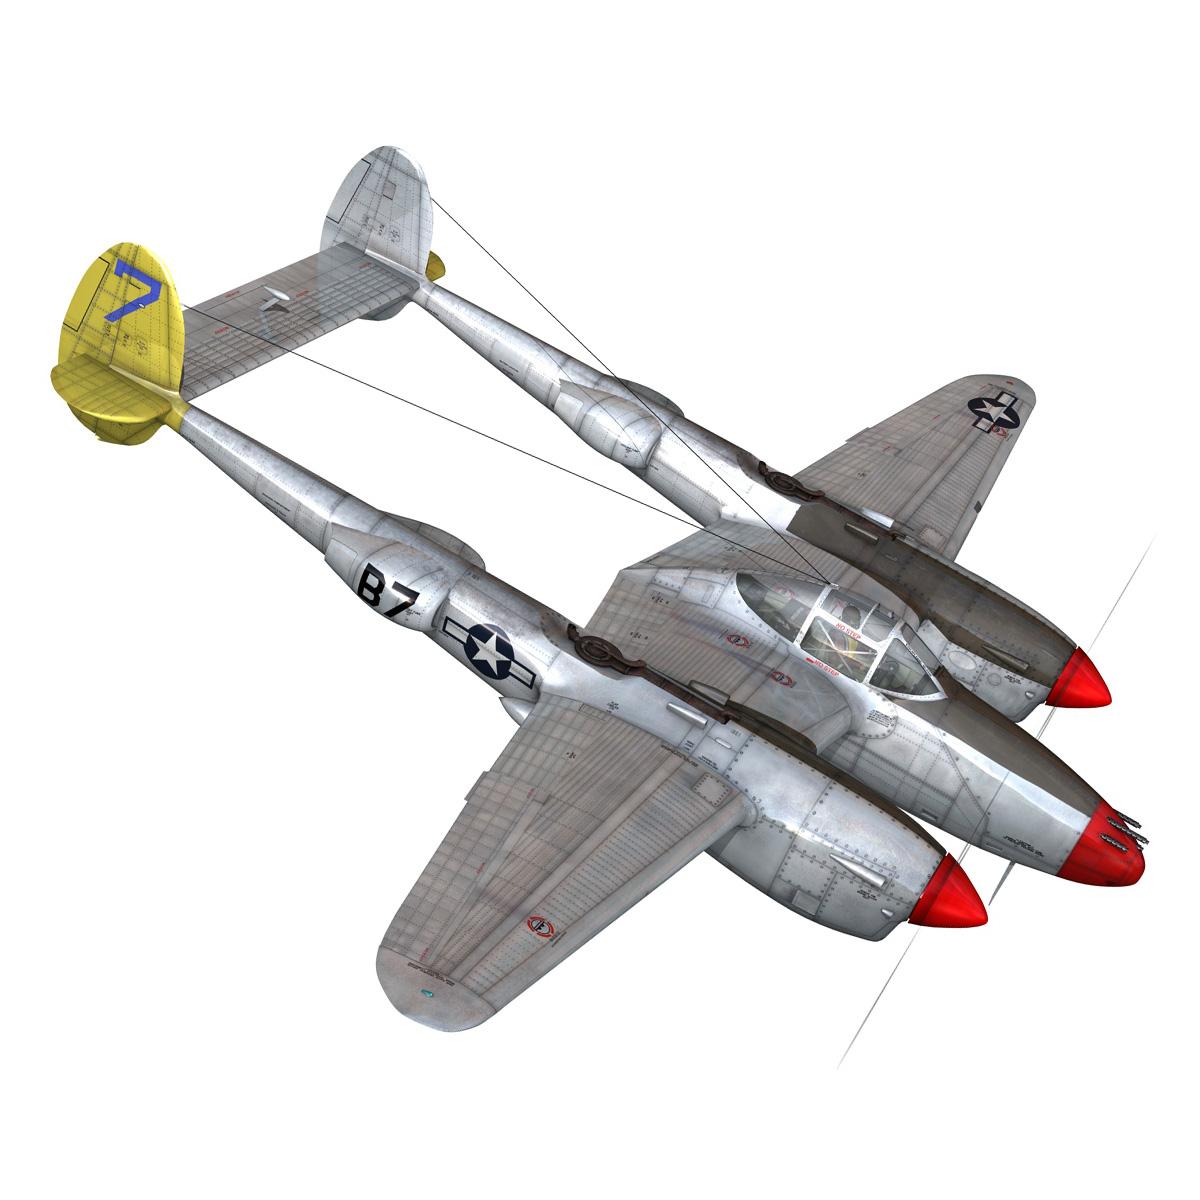 lockheed p-38 lightning – beautiful bitch 3d model fbx c4d lwo obj 272670